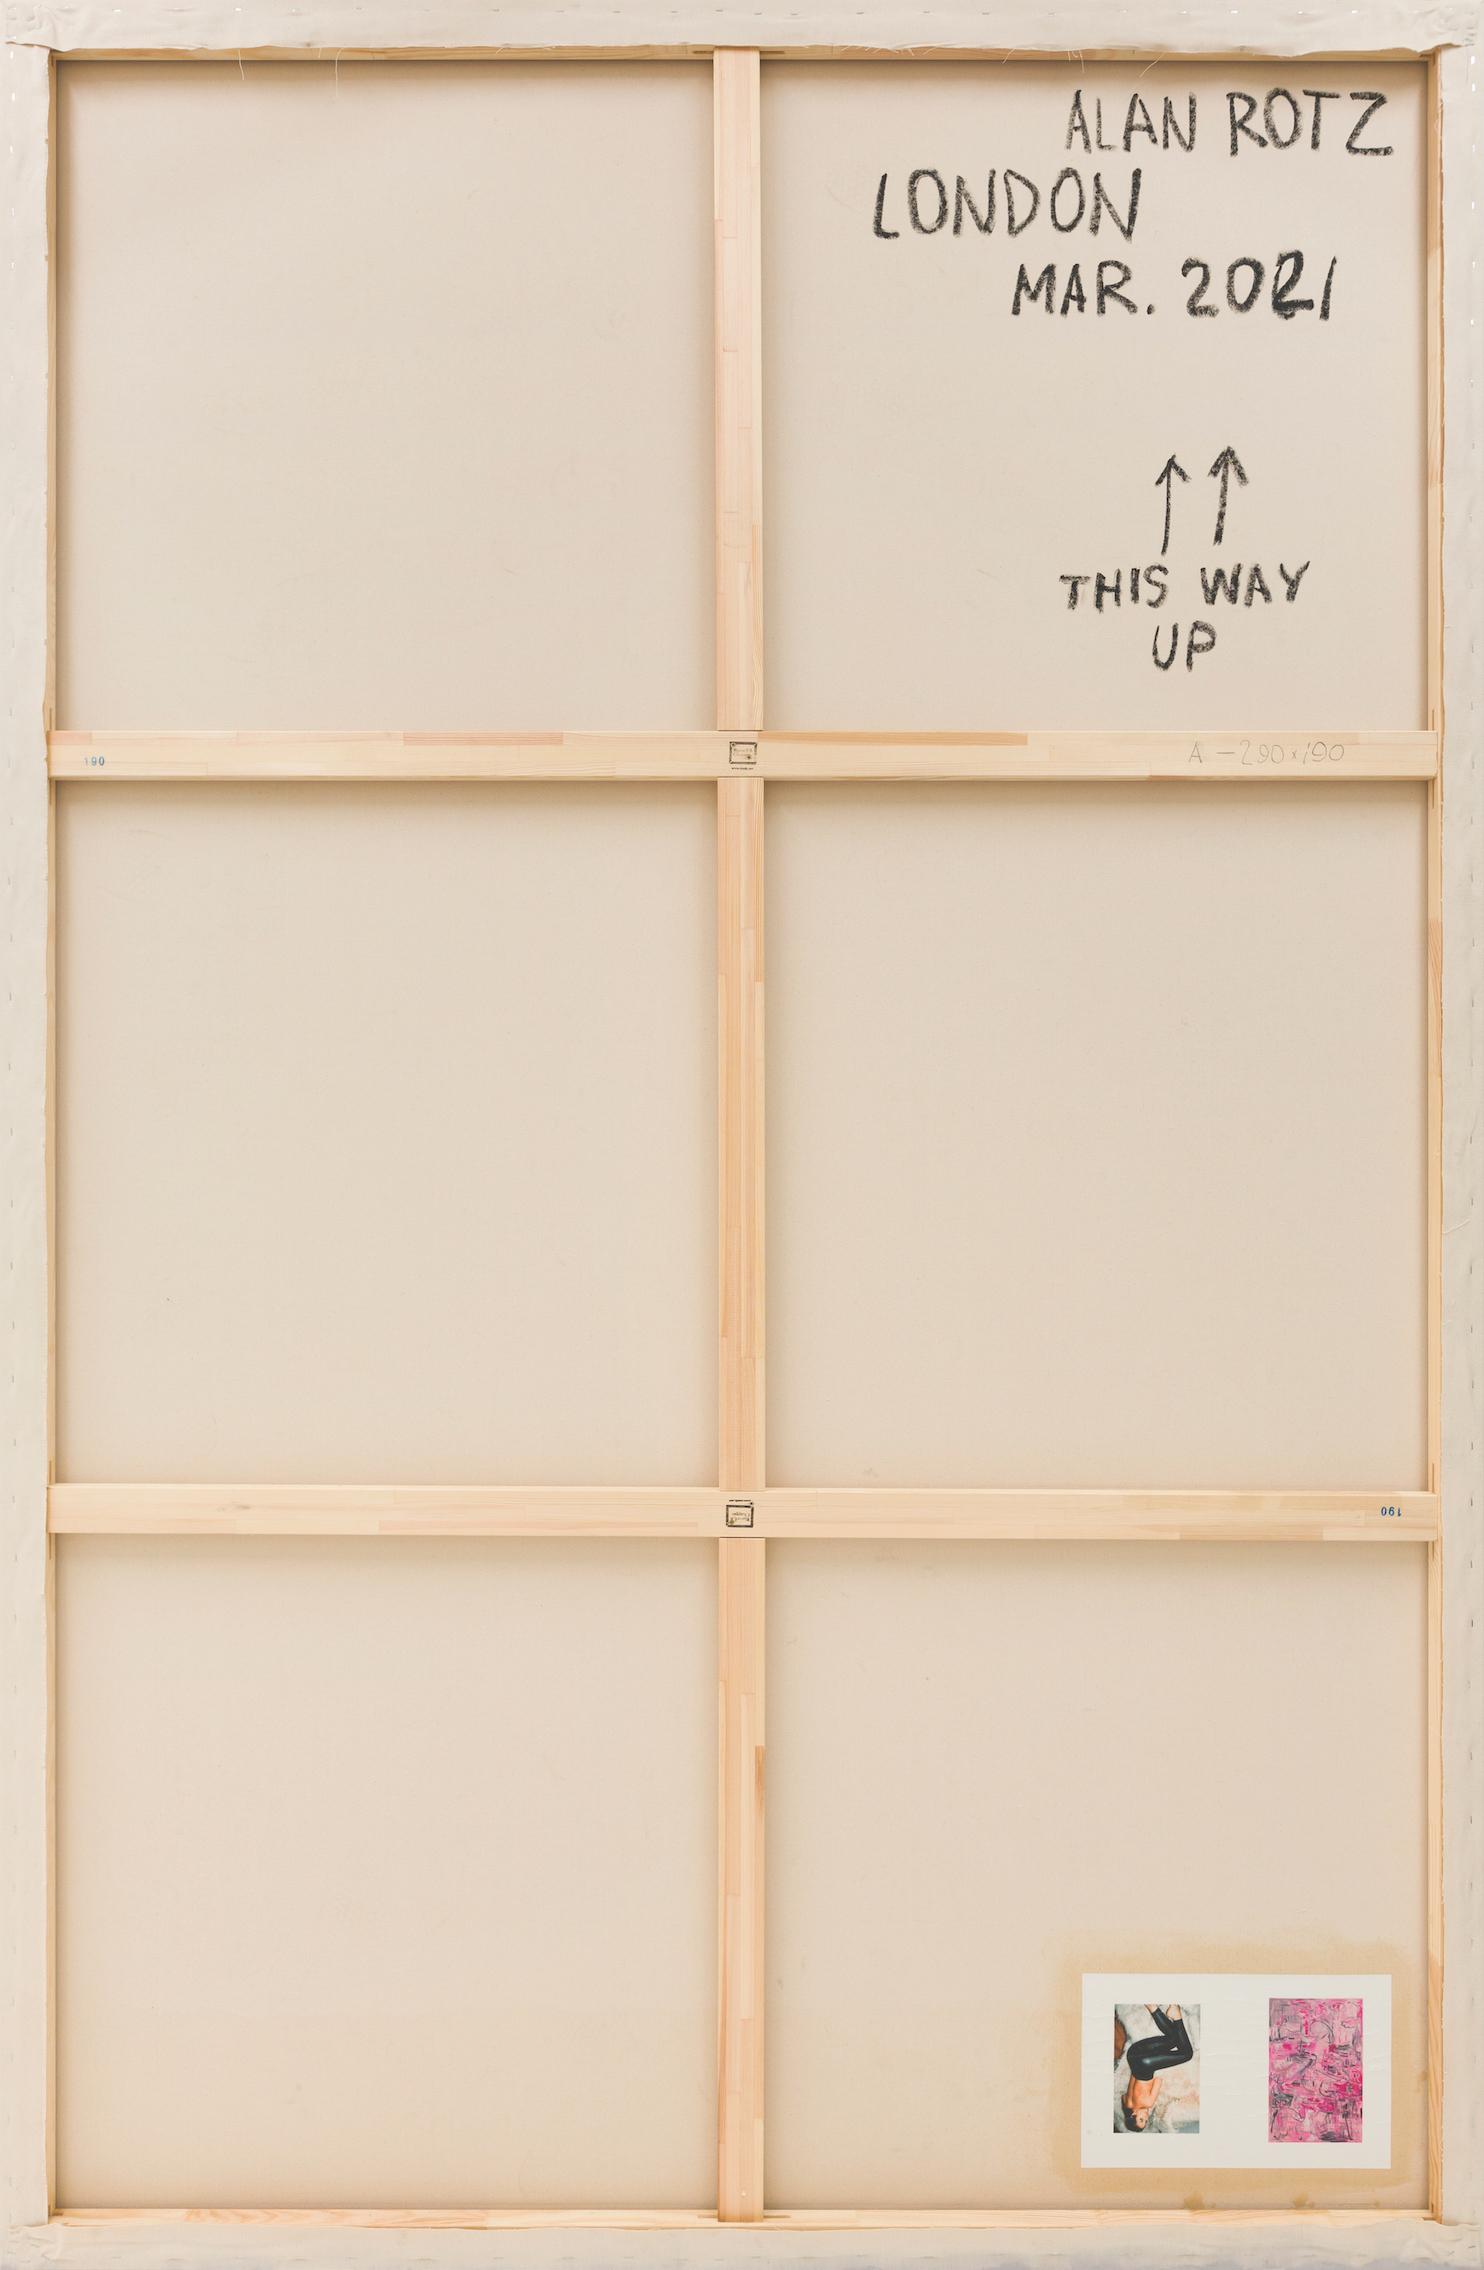 Alan Rotz, London, 2021, oil stick, print on paper, oil and acrylic on canvas, laminated wood, 290 x 190 cm (114 11/64 x 74 51/64 inches). © 2021, Alan Rotz. Photo: Vladimir Umanetz.